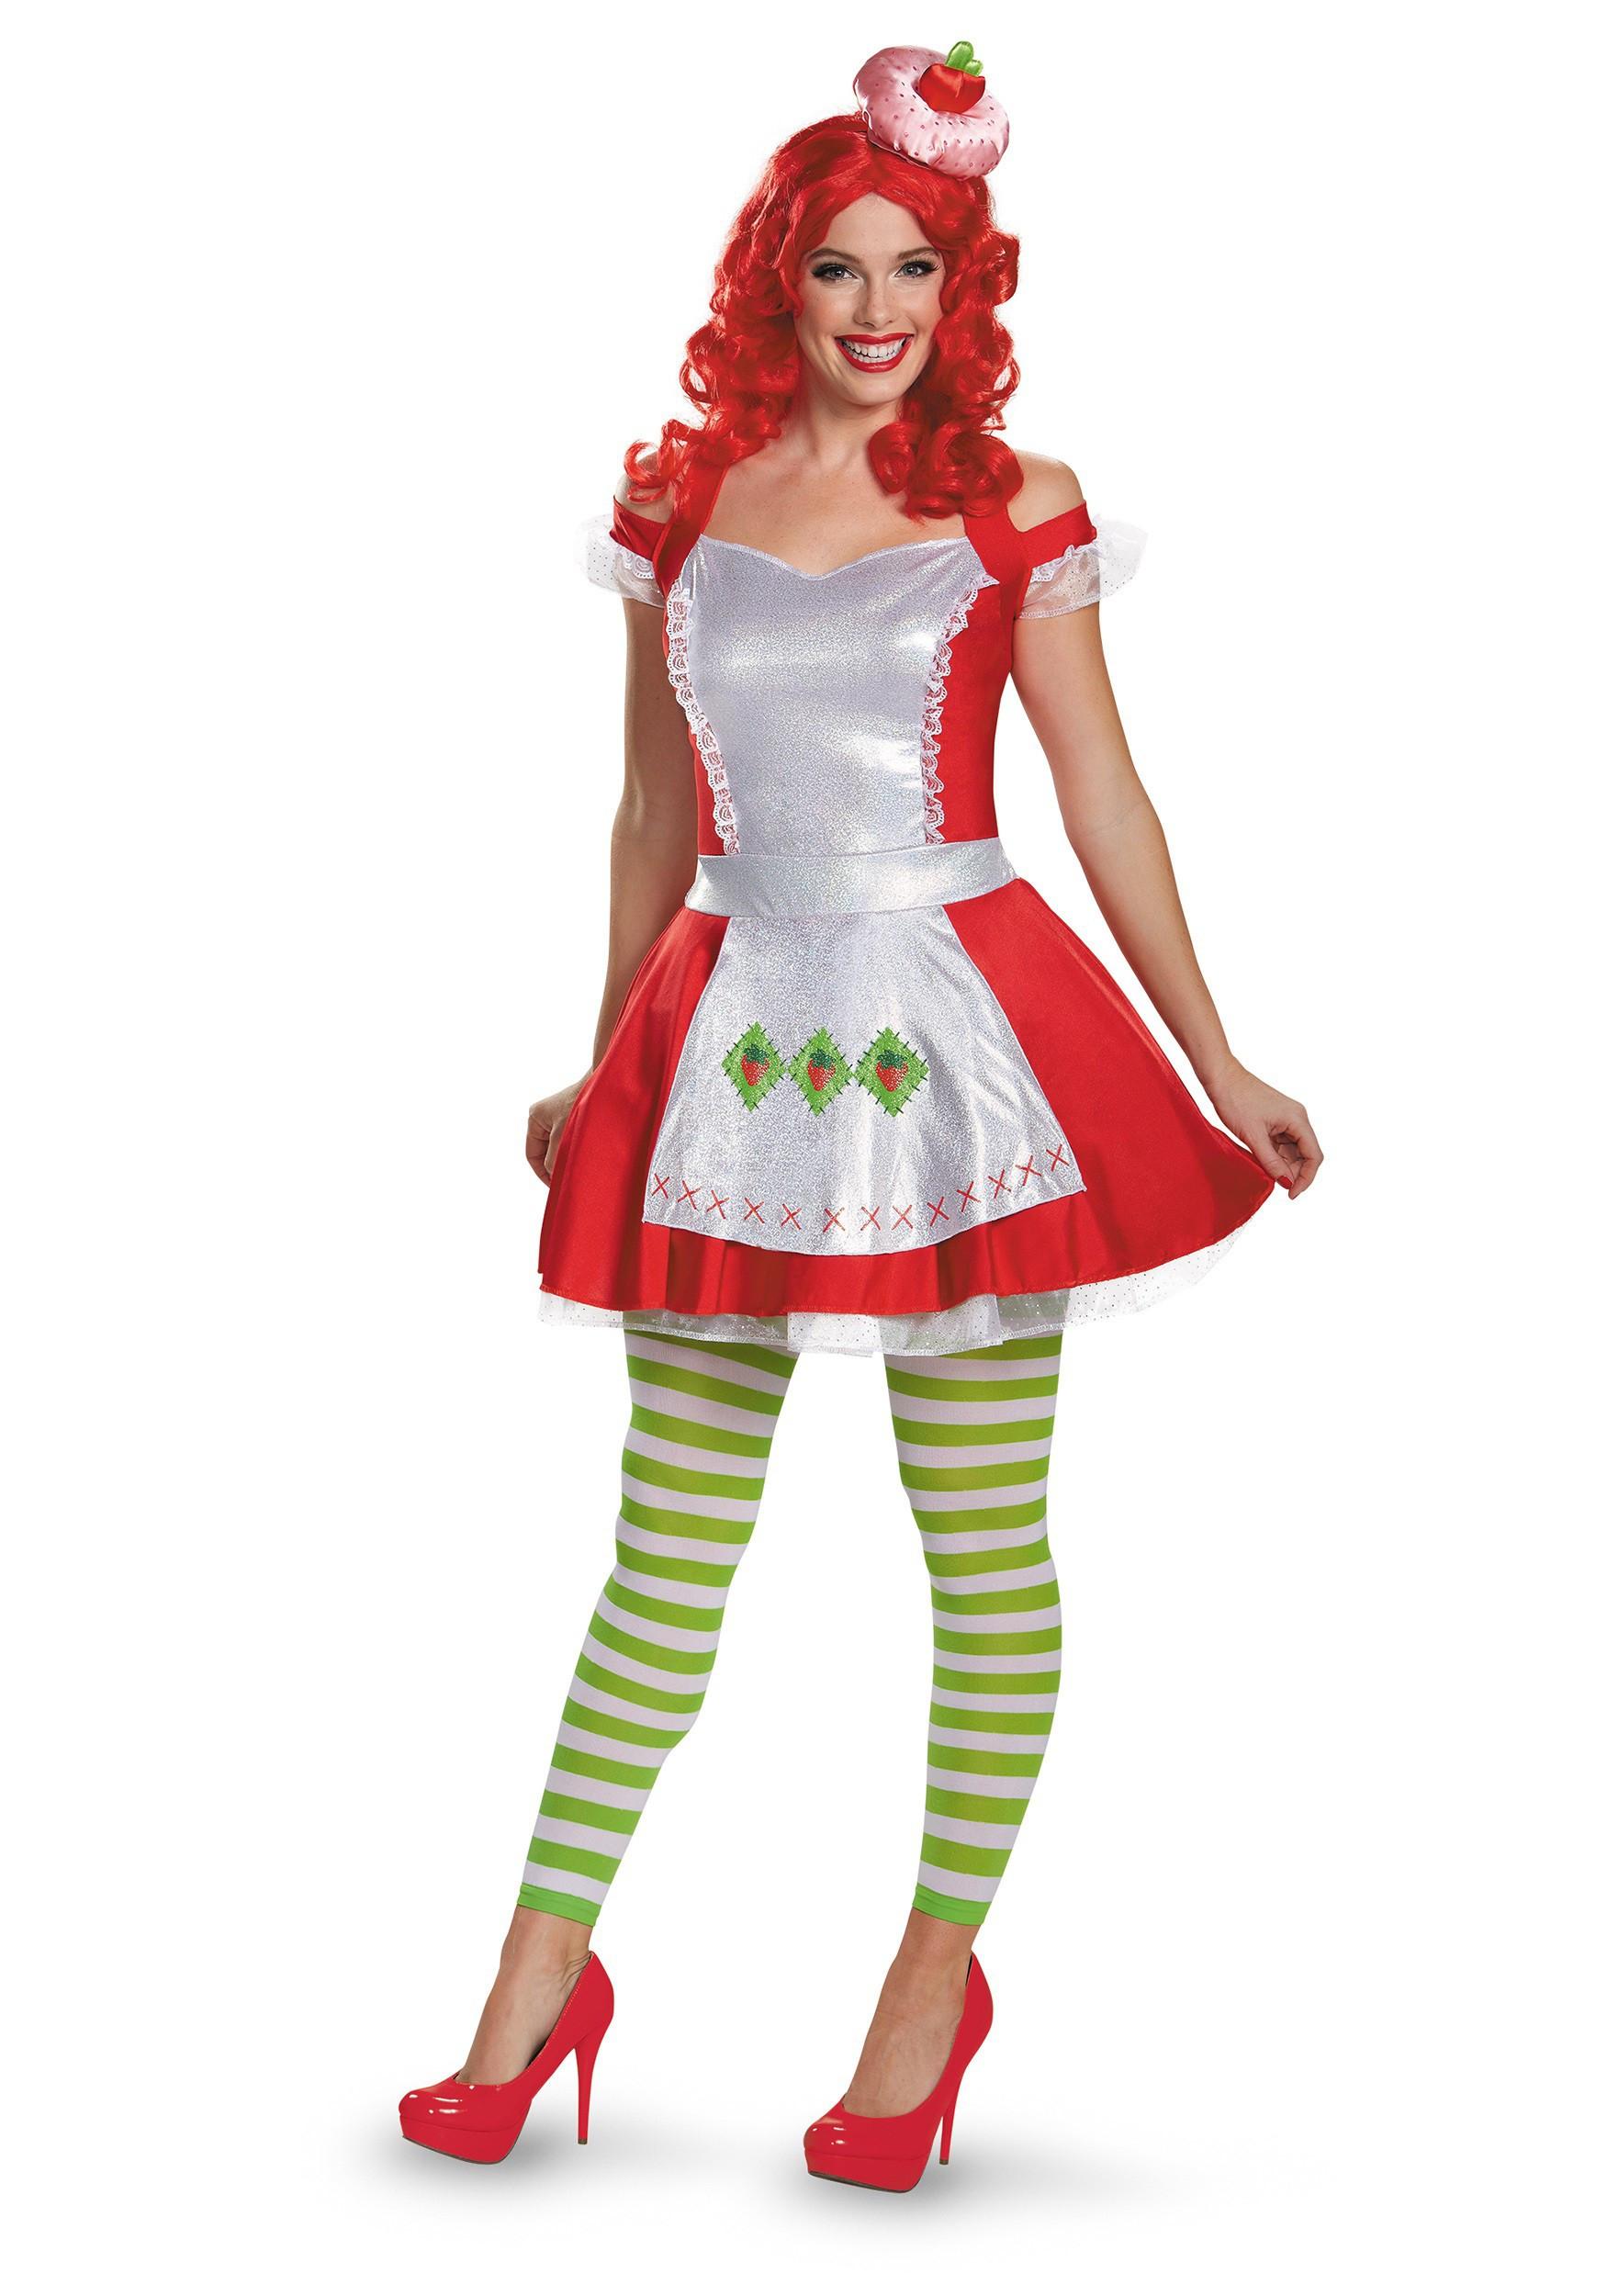 Strawberry Shortcake Haloween Costume  Strawberry Shortcake Deluxe Adult Costume